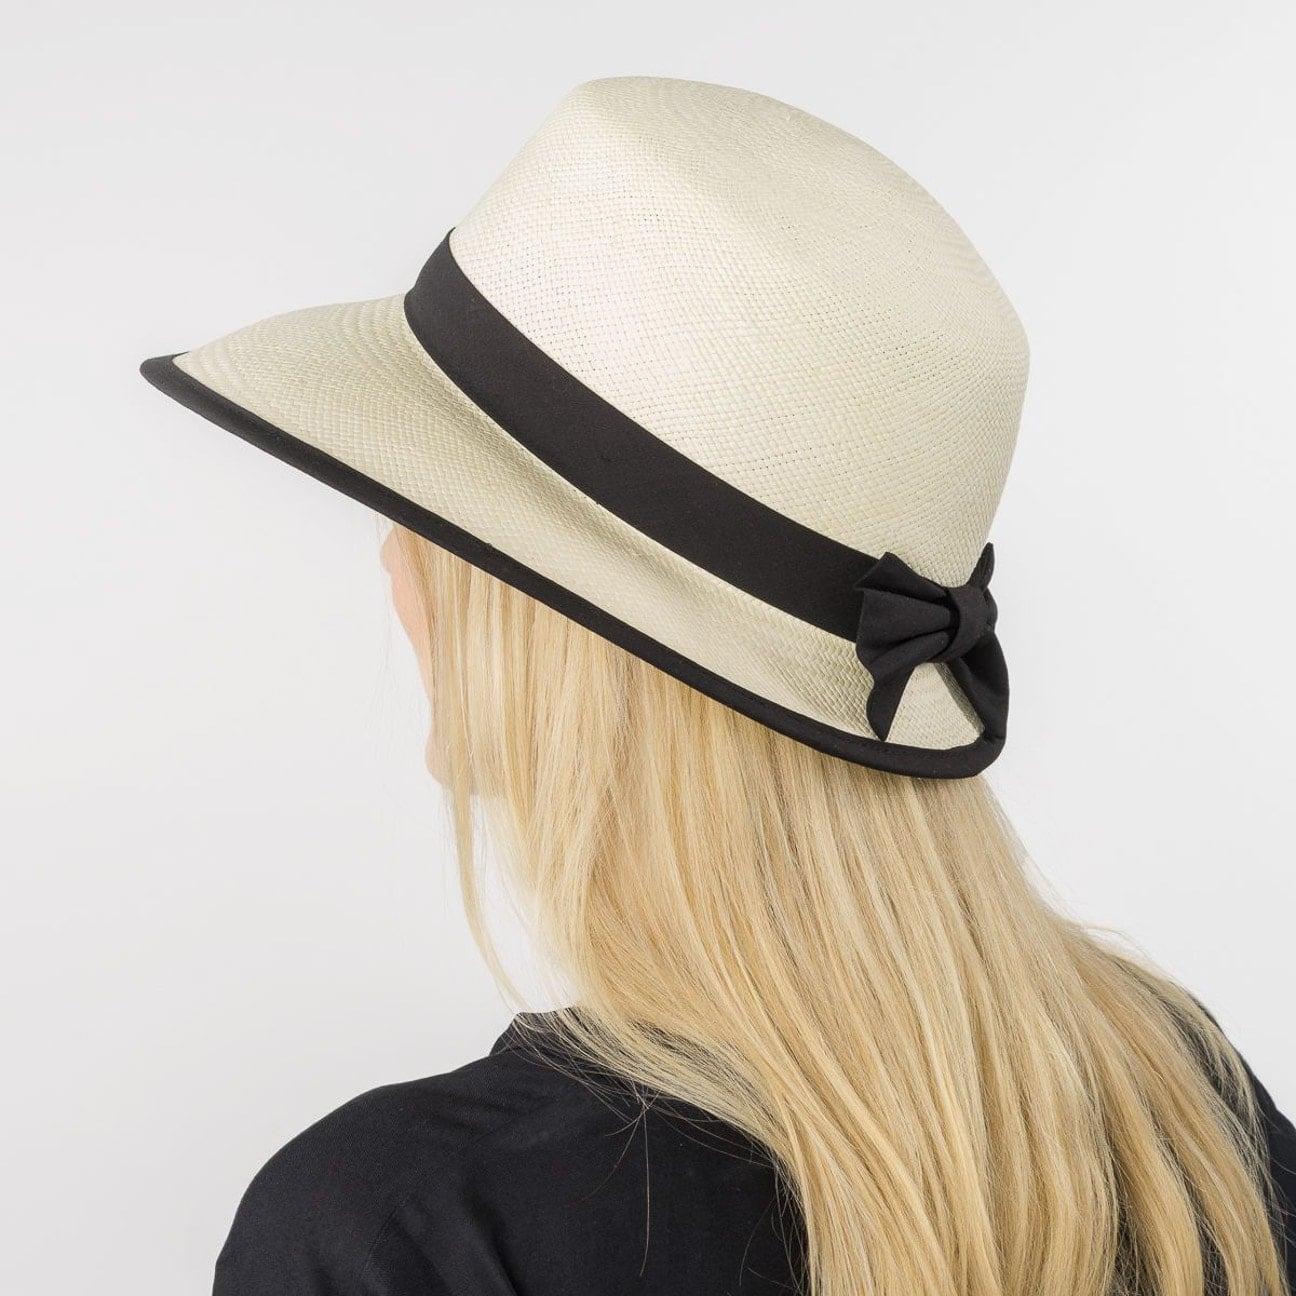 Vina Panama Hat by Lierys Sun hats Lierys T4UZz2vat